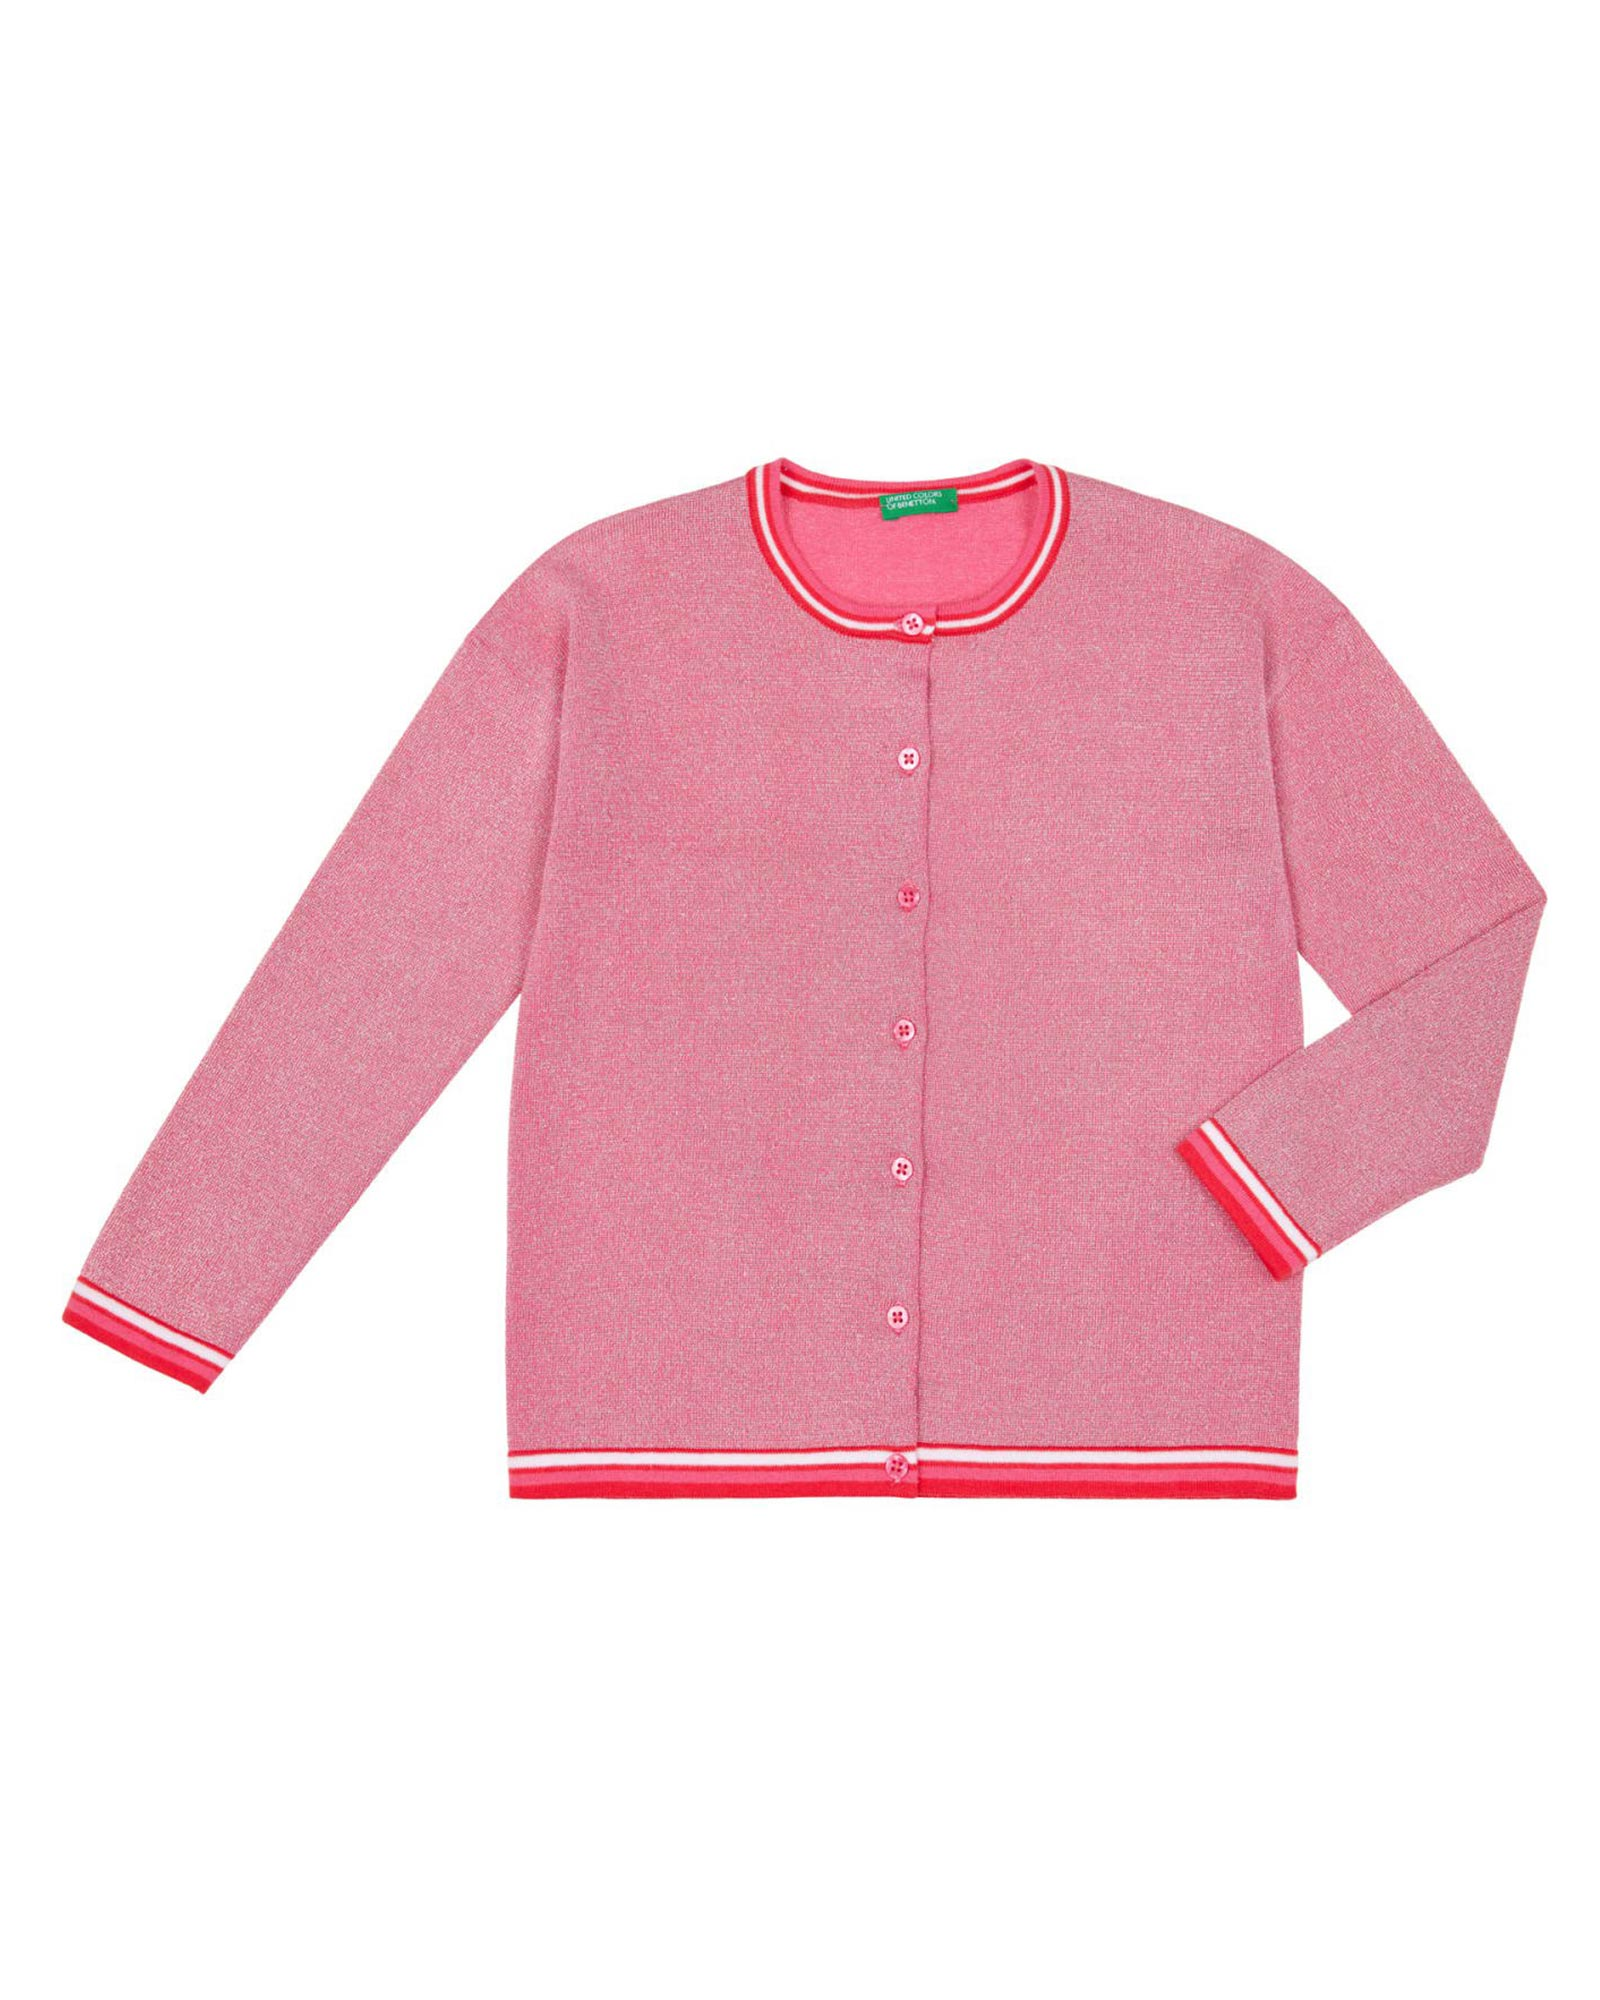 2e350197e4d Κοριτσίστικη Ένδυση Παιδική Collection 2019 | Benetton